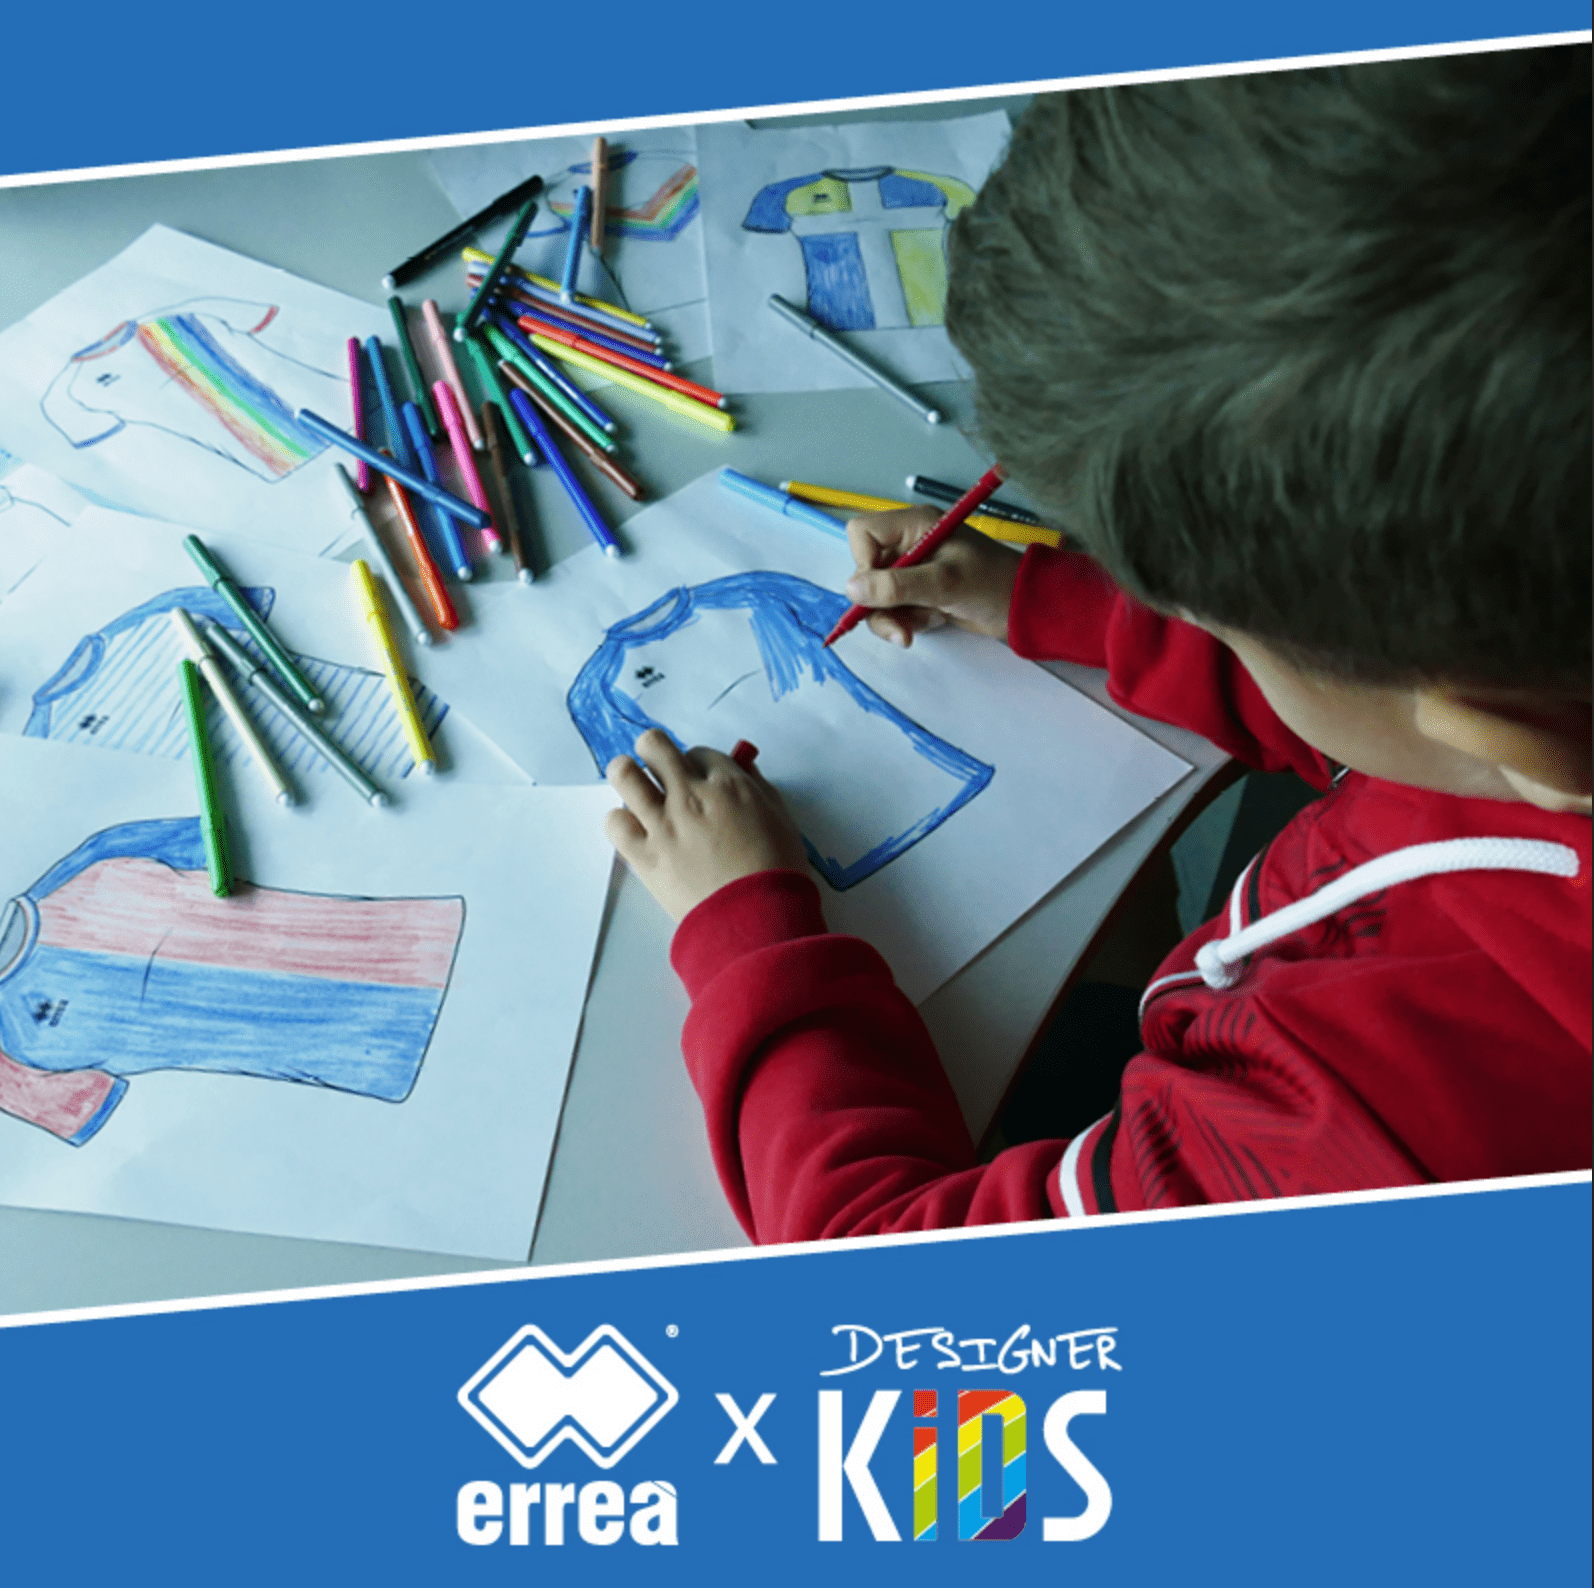 errea-for-designer-kids-limagination-des-enfants-sur-les-maillots-de-volley-1